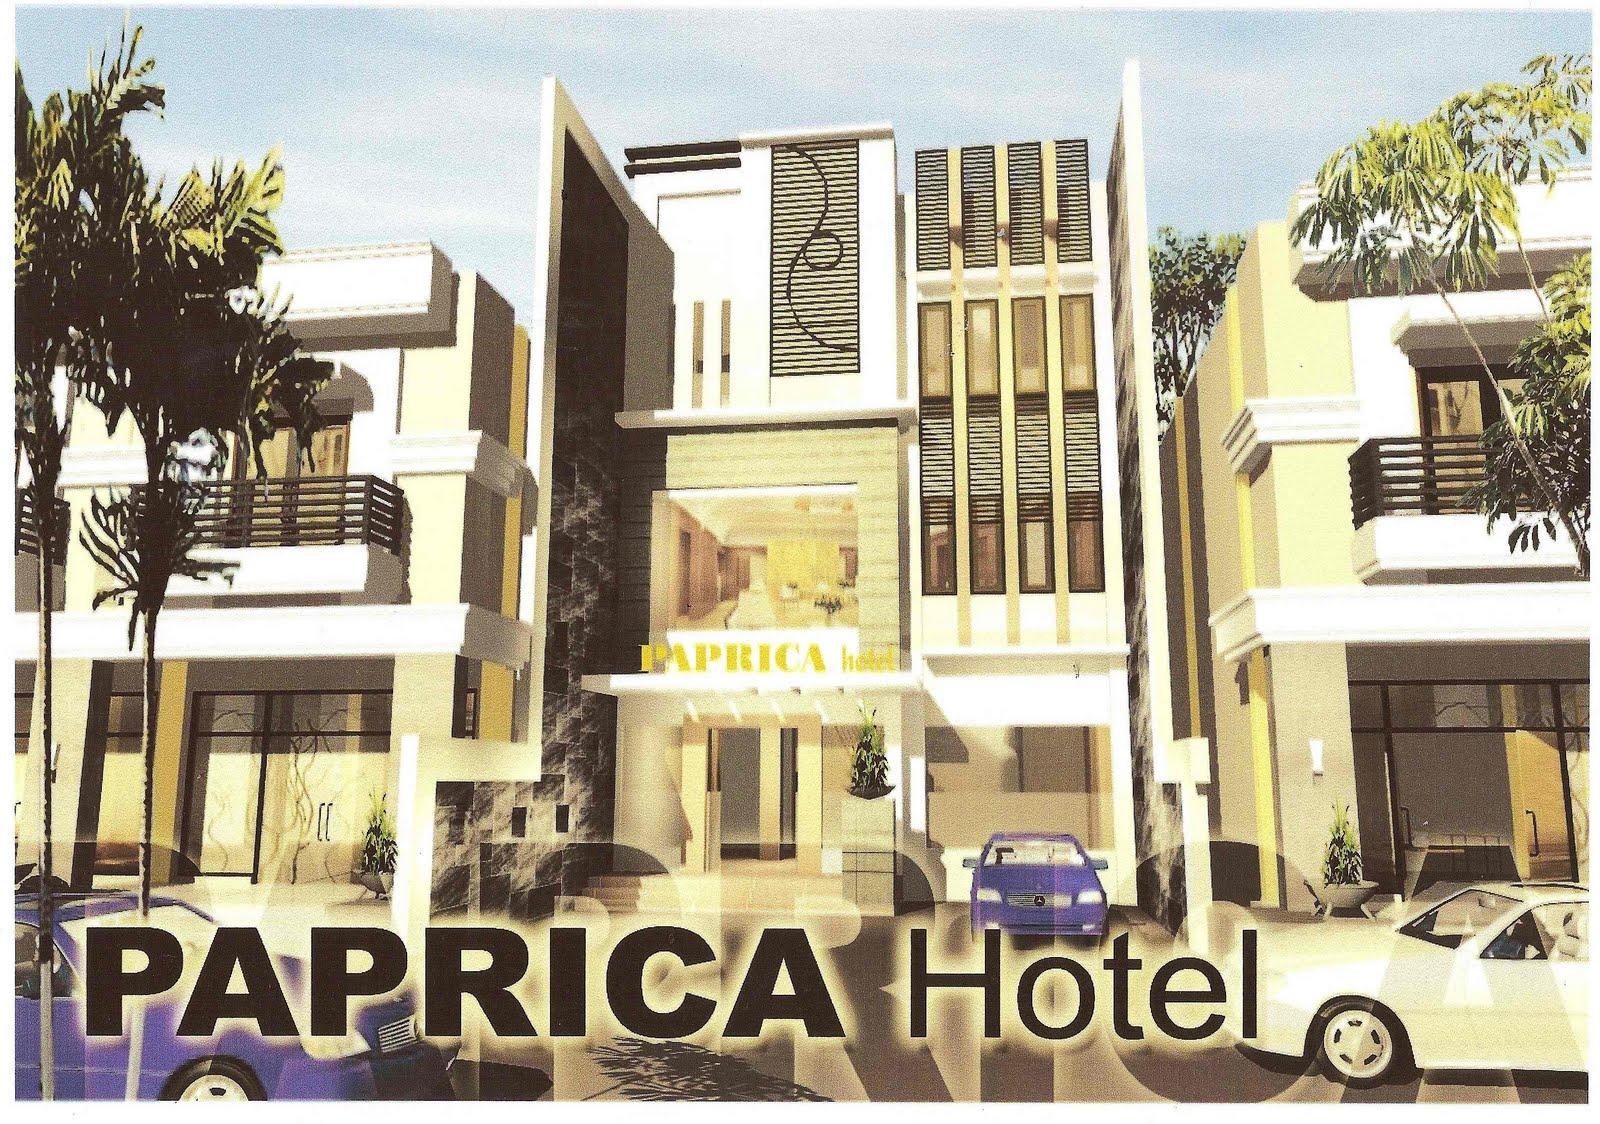 Hotel Paprica 1 Paprica Hotel